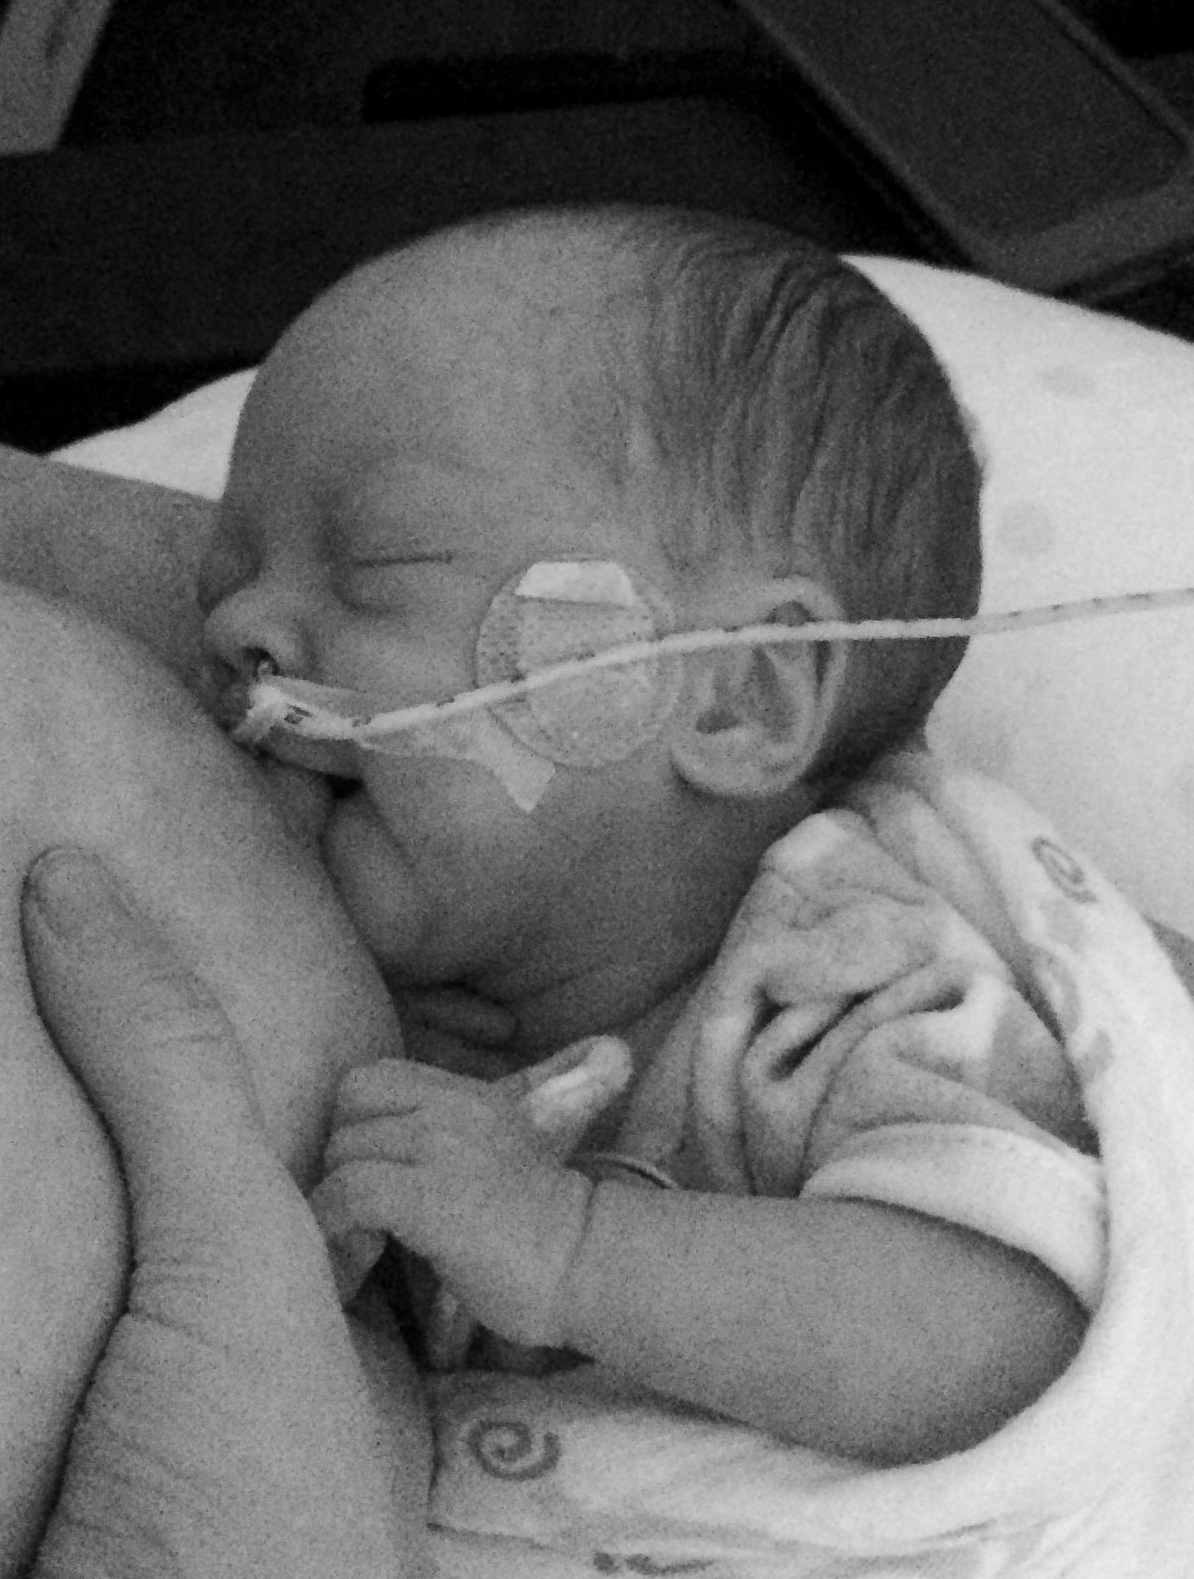 mourning the end of breastfeeding - shegotguts.com